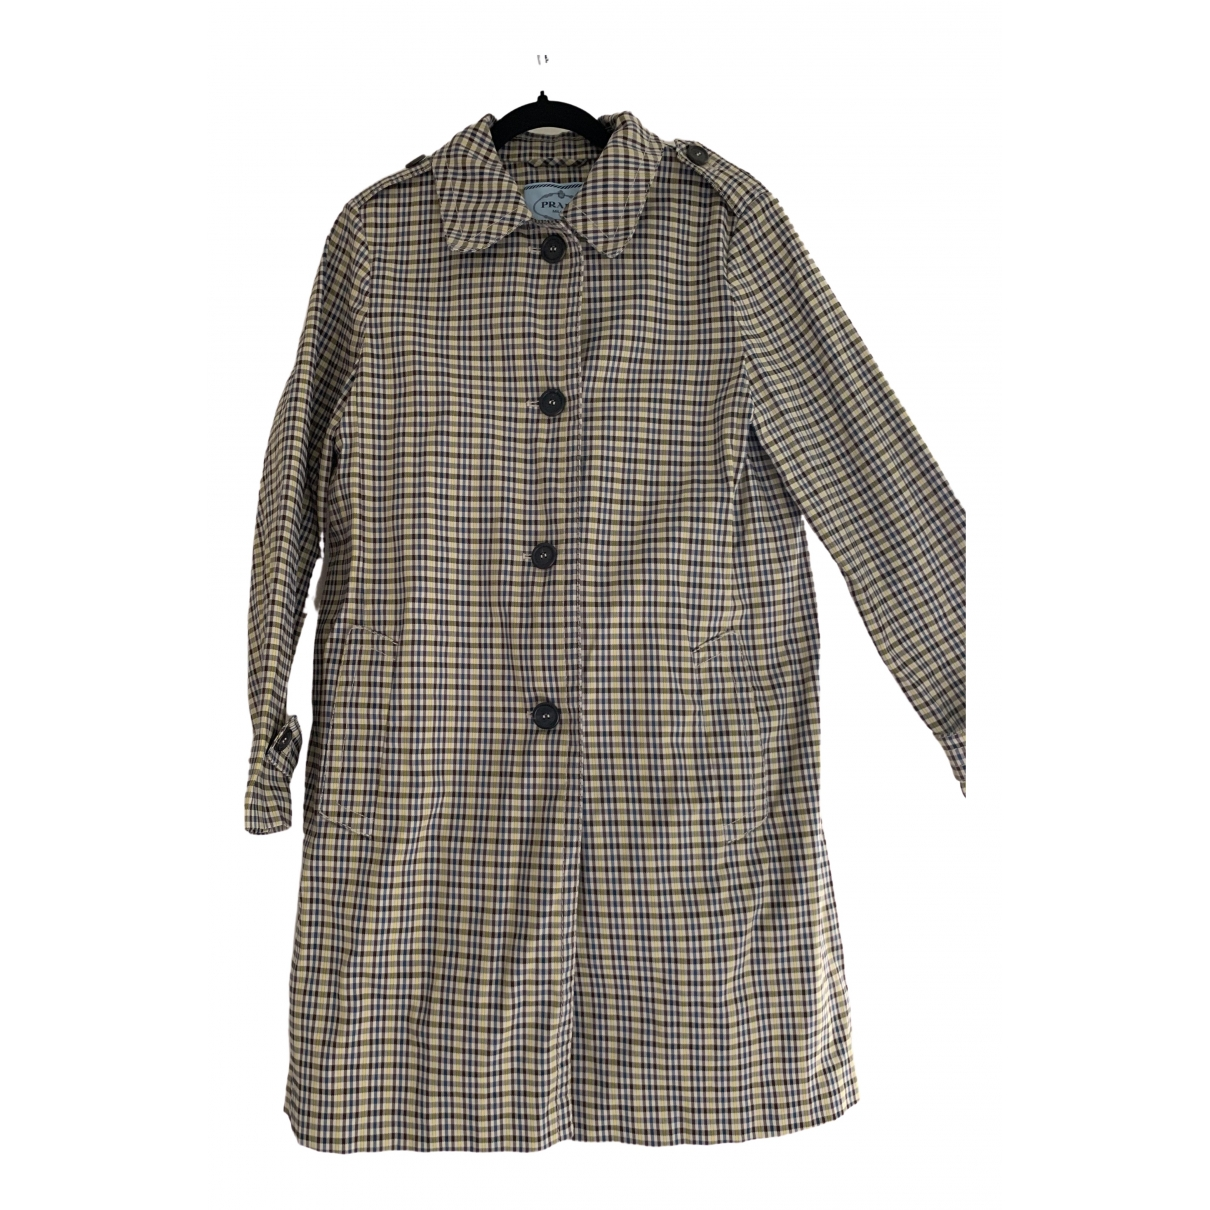 Prada - Manteau   pour femme - multicolore